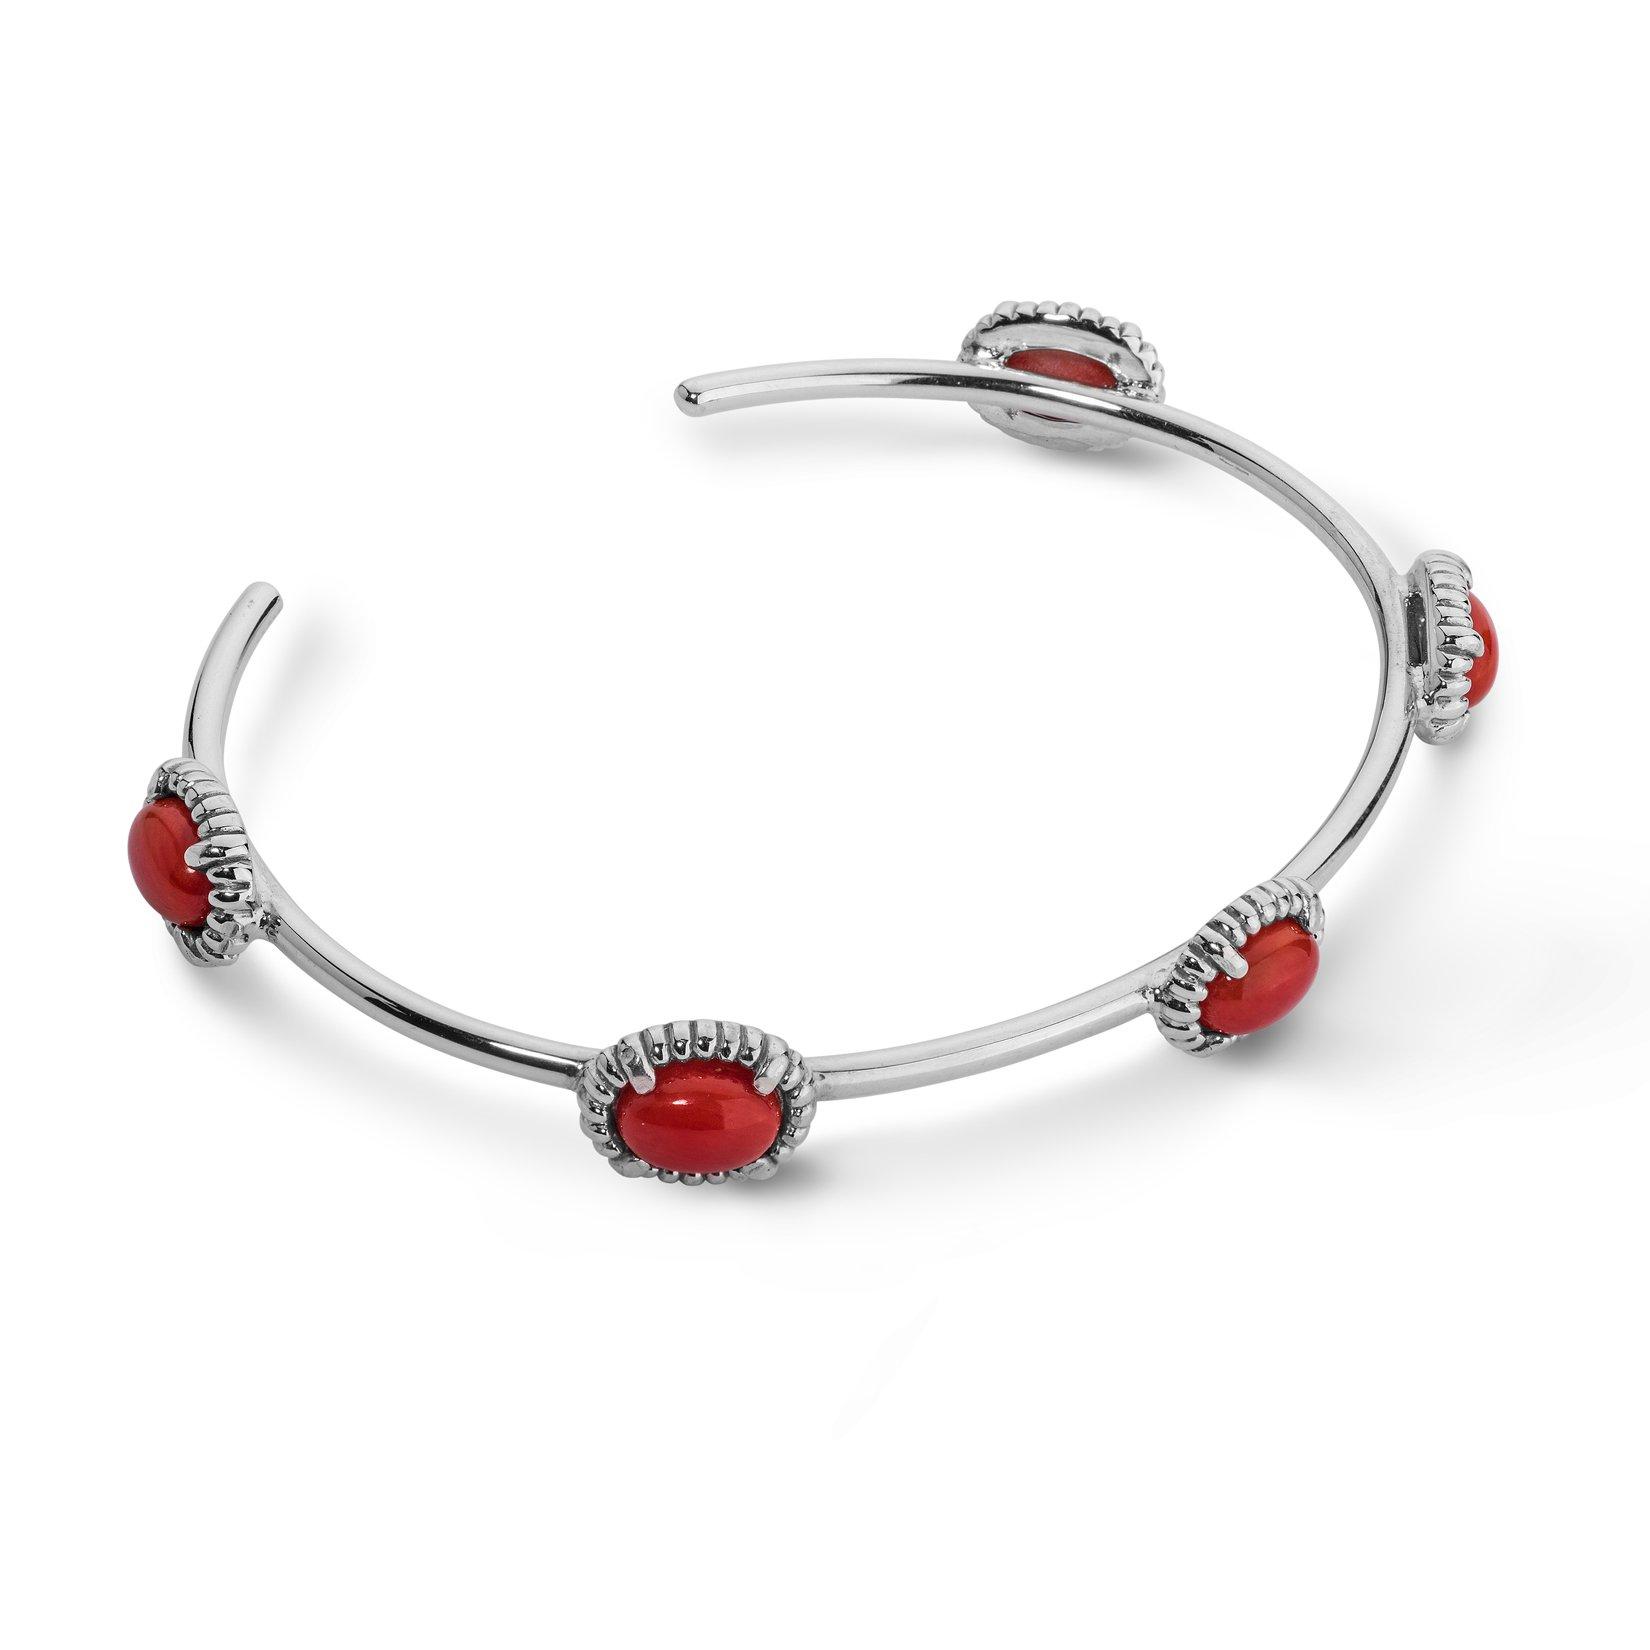 JEN Sterling Silver & Red Coral Five Stone Cuff Bracelet